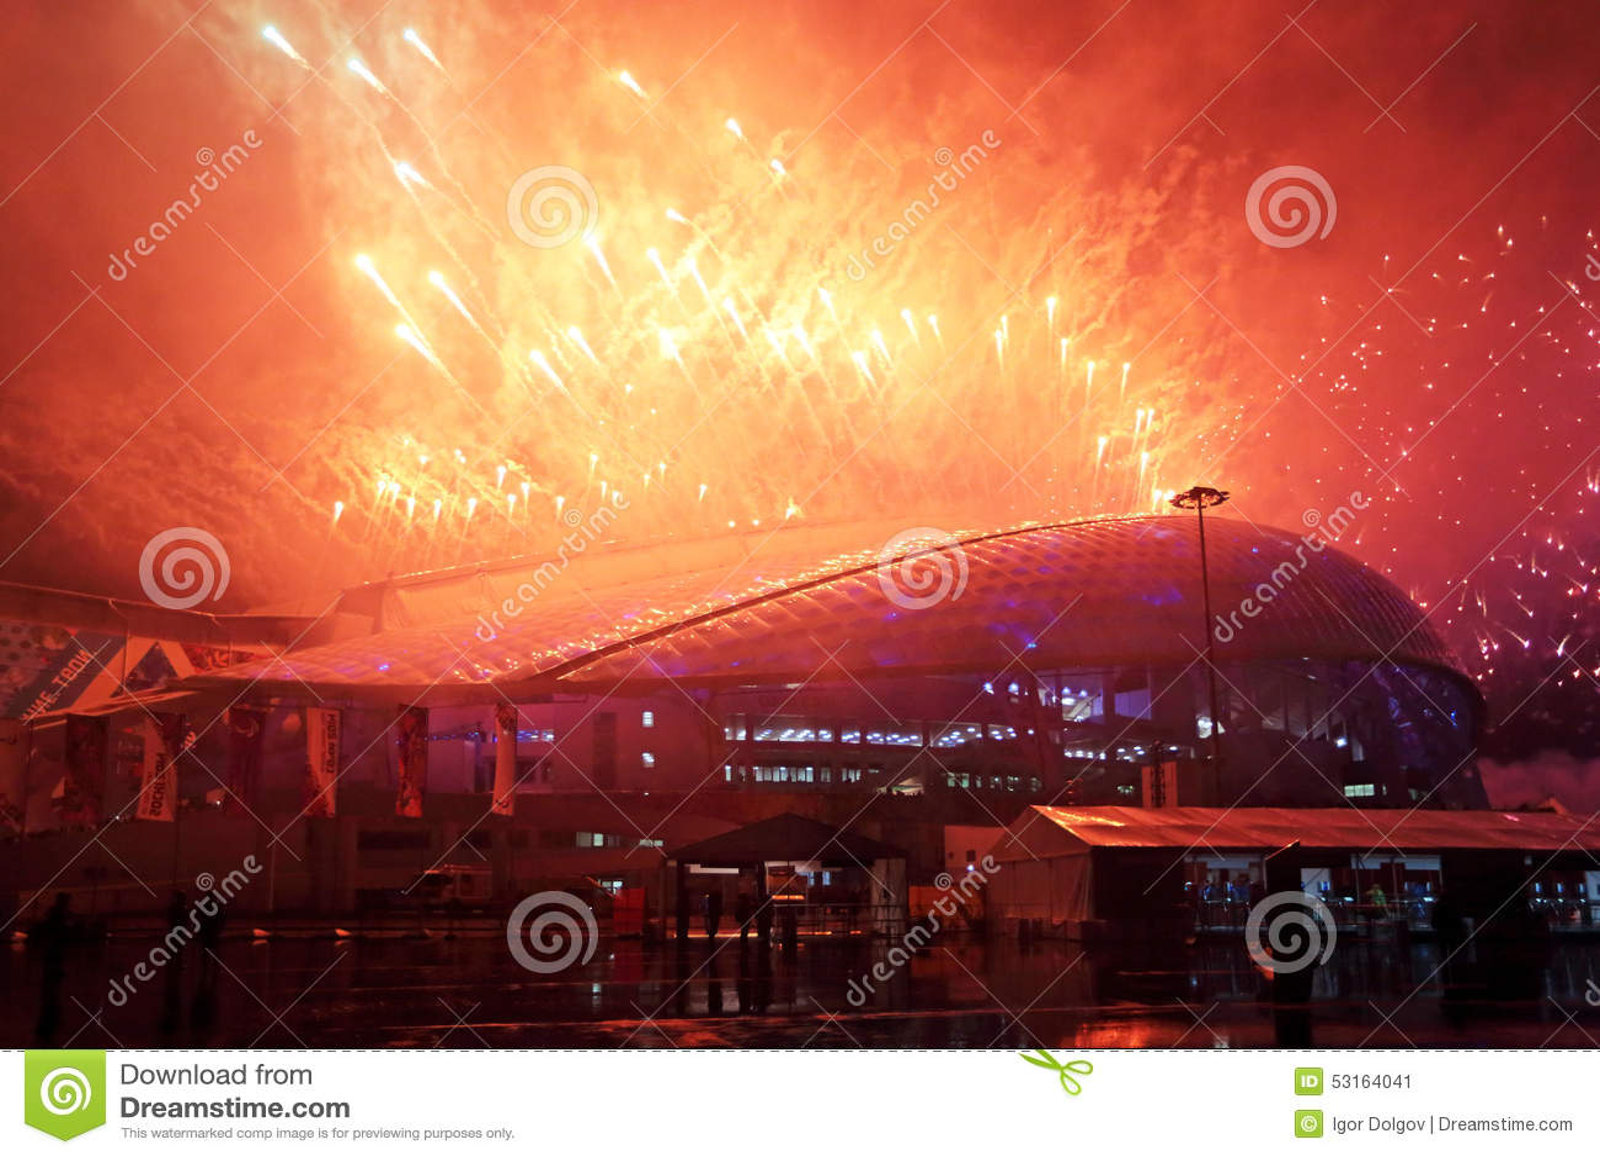 Фейерверки над стадионом Fisht